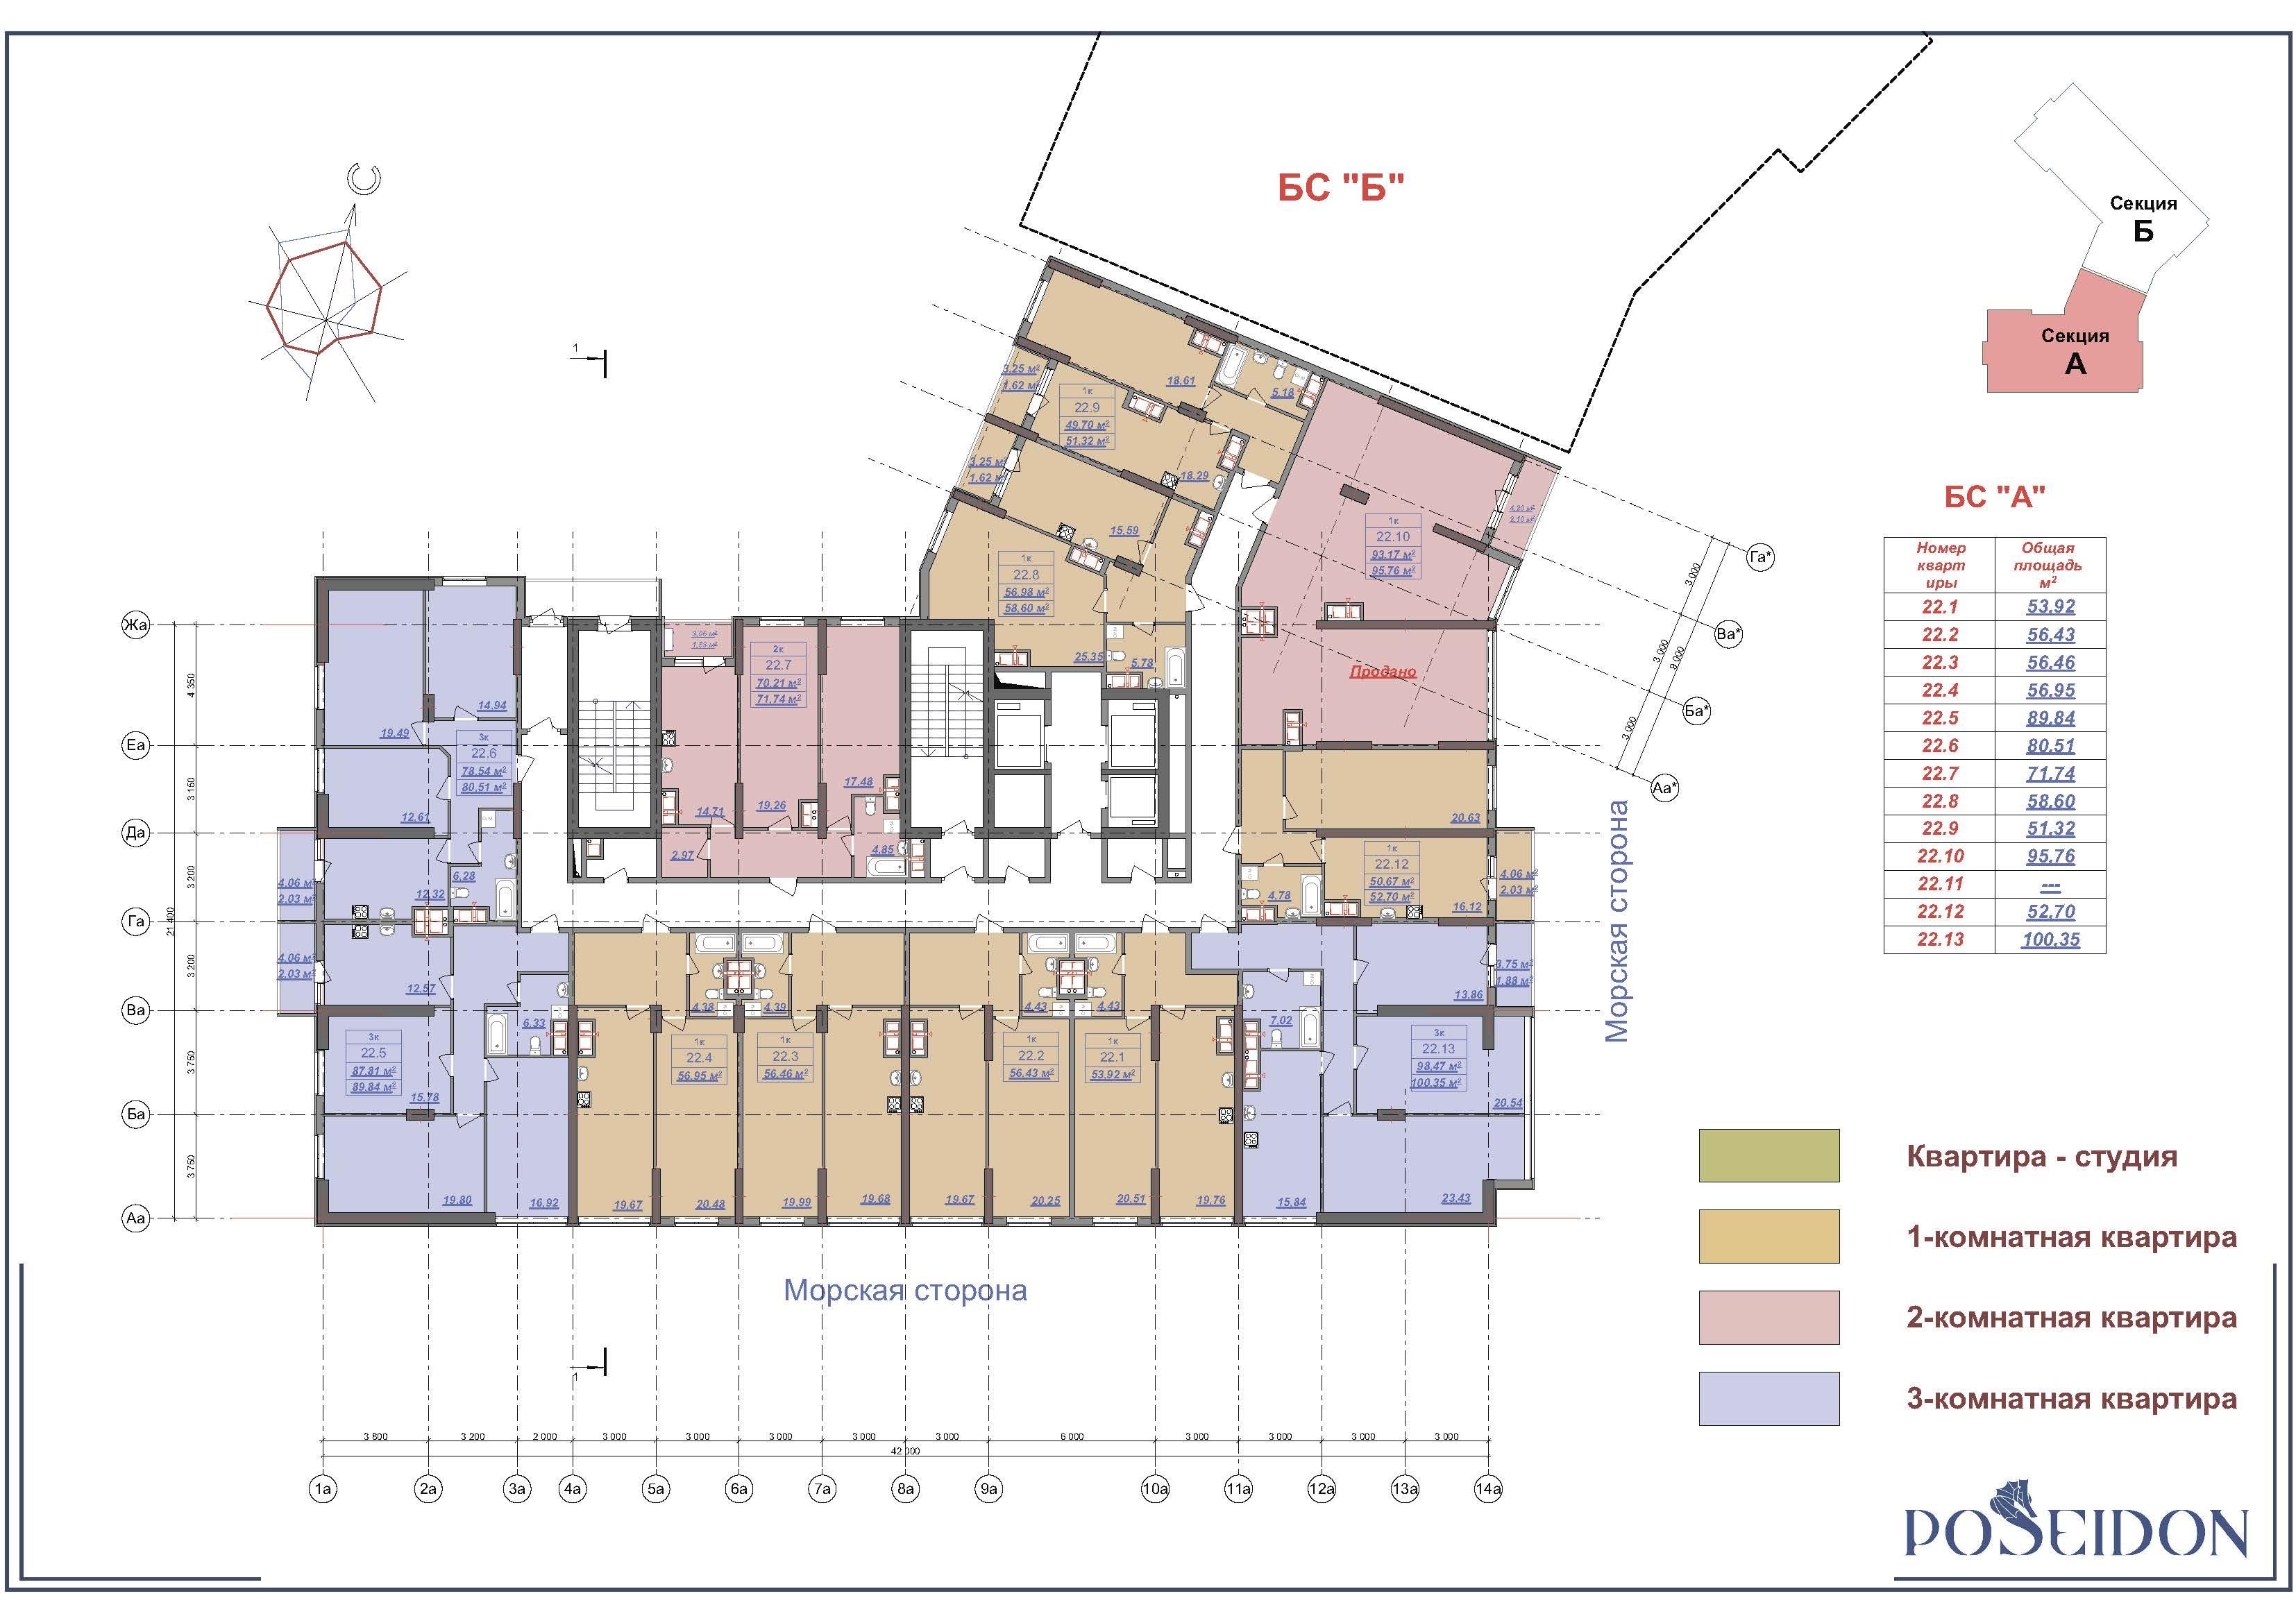 ЖК Посейдон план 22 этажа